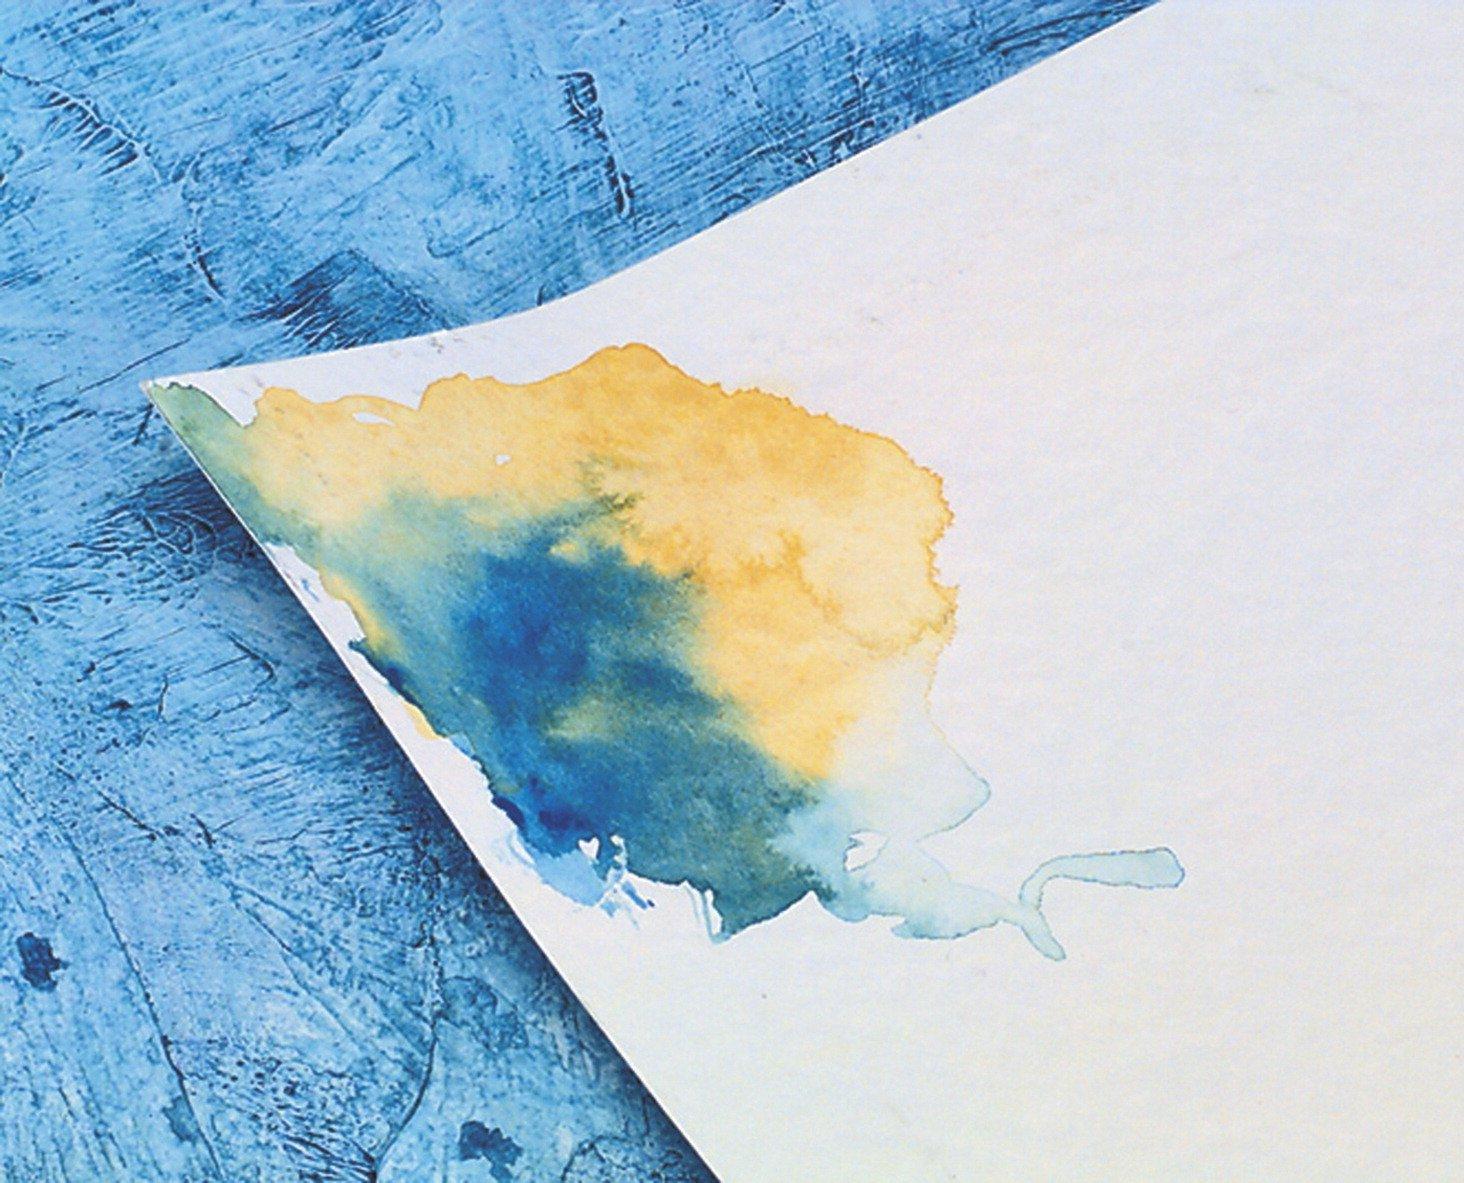 Watercolor artist magazine customer service - Amazon Com Strathmore 473 98 Artist Quality Cold Press Paper 22 X 30 Size Watercolor Industrial Scientific